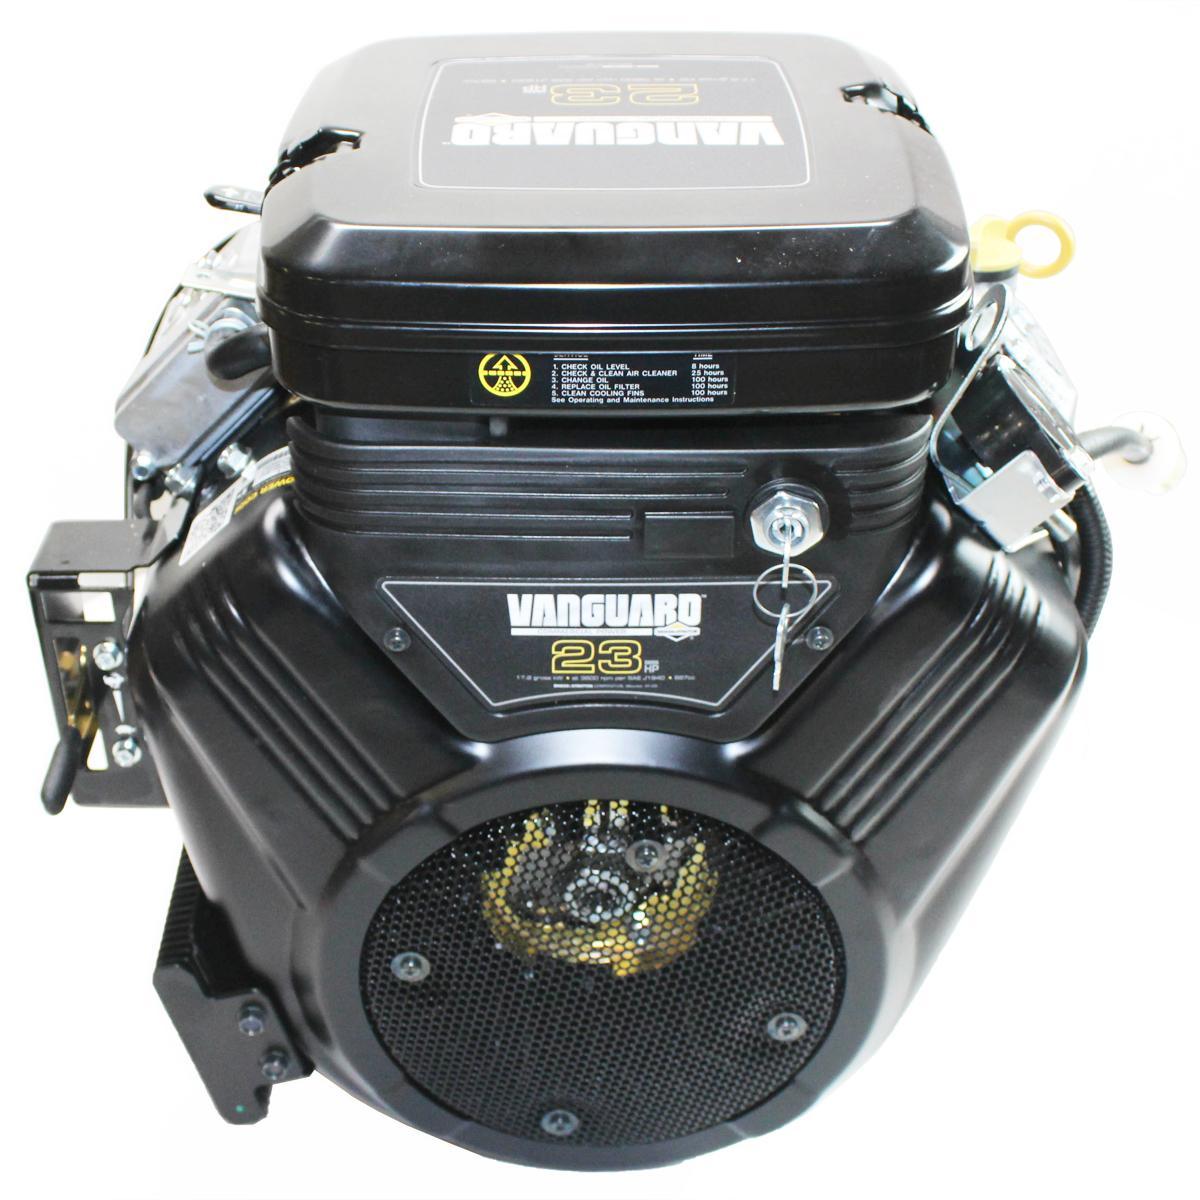 "23hp Vanguard Horizontal 1""x2-29/32"" Shaft, Electric Start, Fuel Pump, Oil Filter & Cooler, Key Switch Briggs & Stratton Engine"